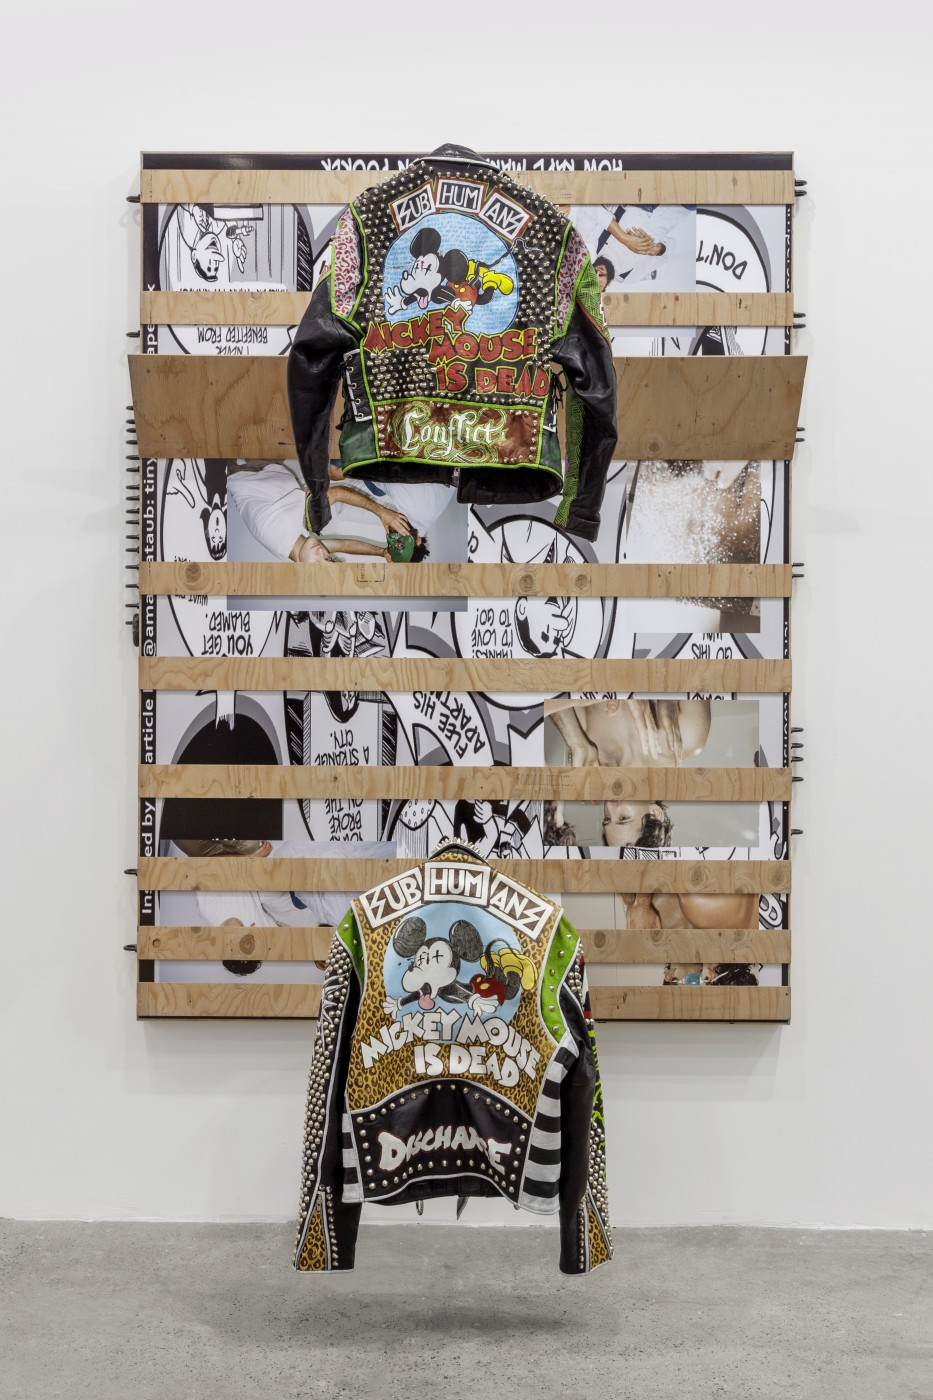 "<div class=""title""><em>Untitled</em>, 2017</div><div class=""medium"">Birch plywood, inkjet print mounted on dibond, aluminum, black oxide U-bolts, leather jackets</div><div class=""dimensions"">With Jacket Hangers:<br />202.6 x 161.3 x 70.5 cm<br />79 3/4 x 63 1/2 x 27 3/4 in.<br /><br />Without Jacket Hangers:<br />202.6 x 161.3 x 26.7 cm<br />79 3/4 x 63 1/2 x 10 1/2 in.</div>"